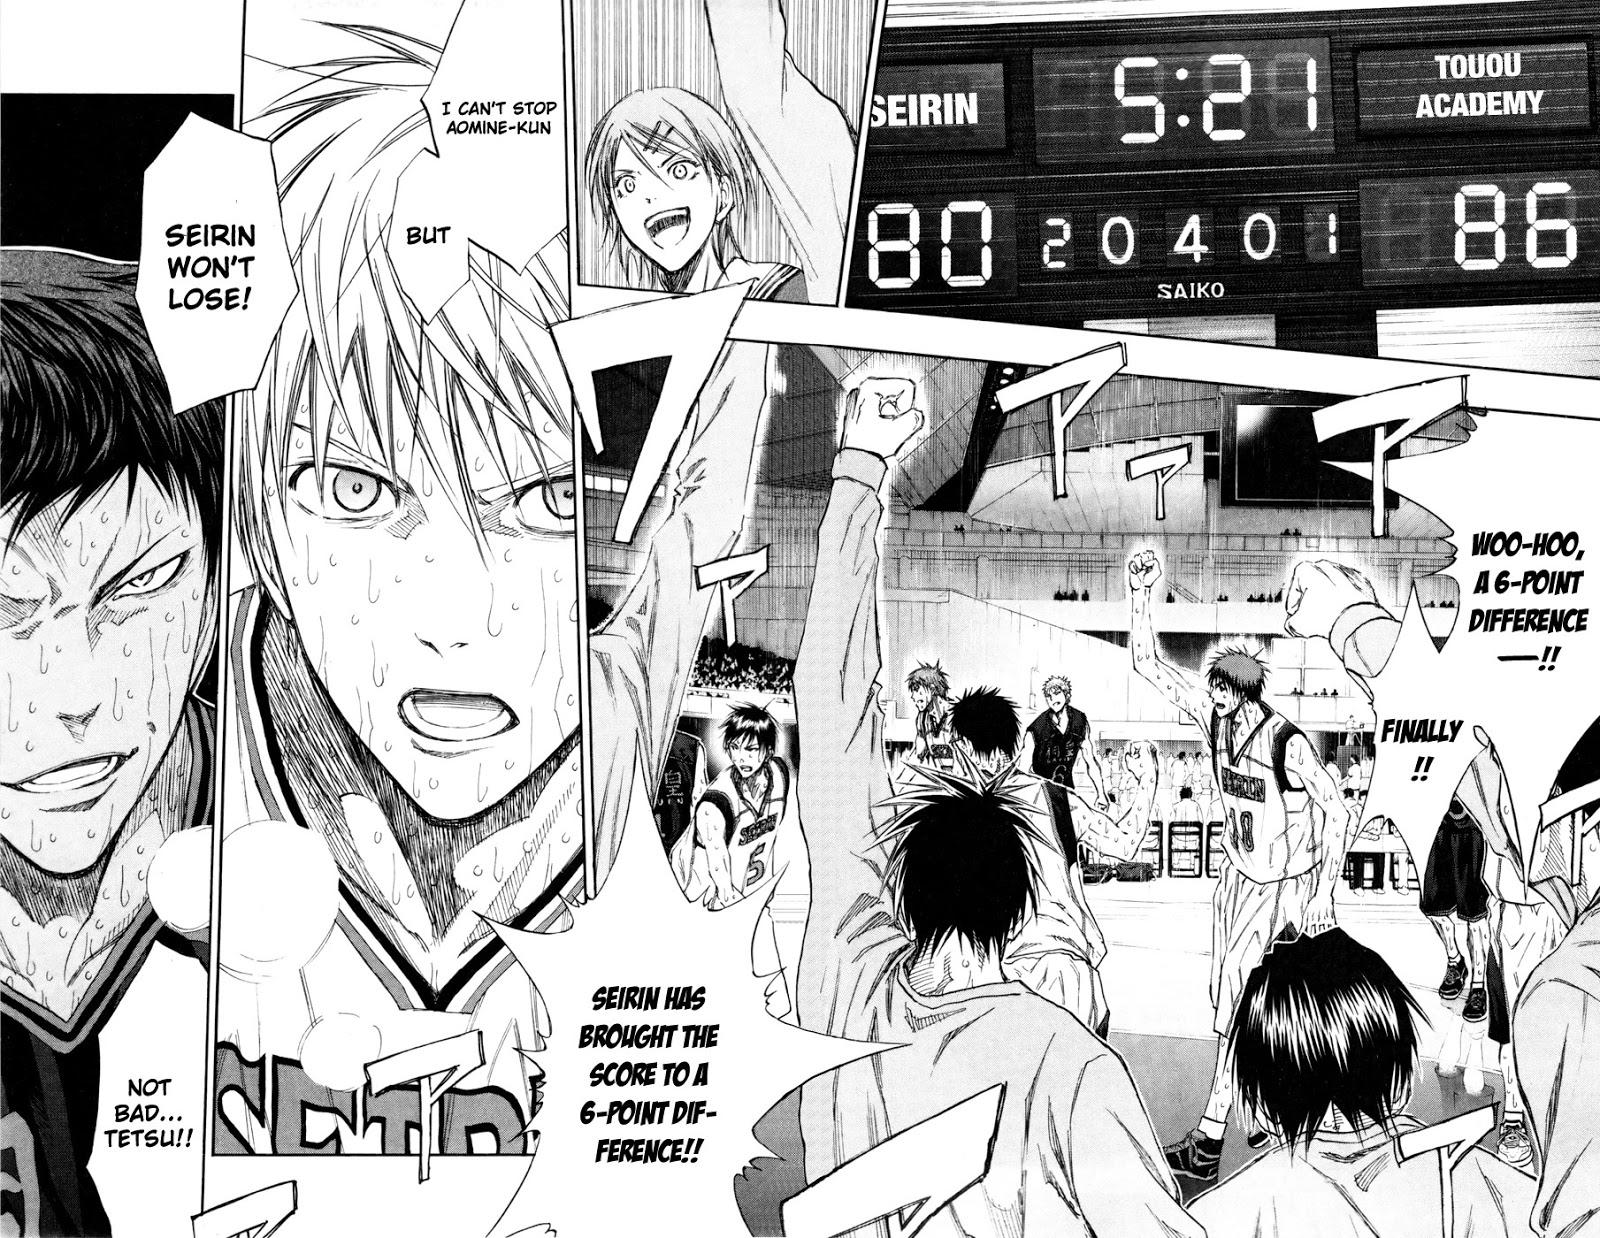 Kuroko no Basket Manga Chapter 132 - Image 14-14